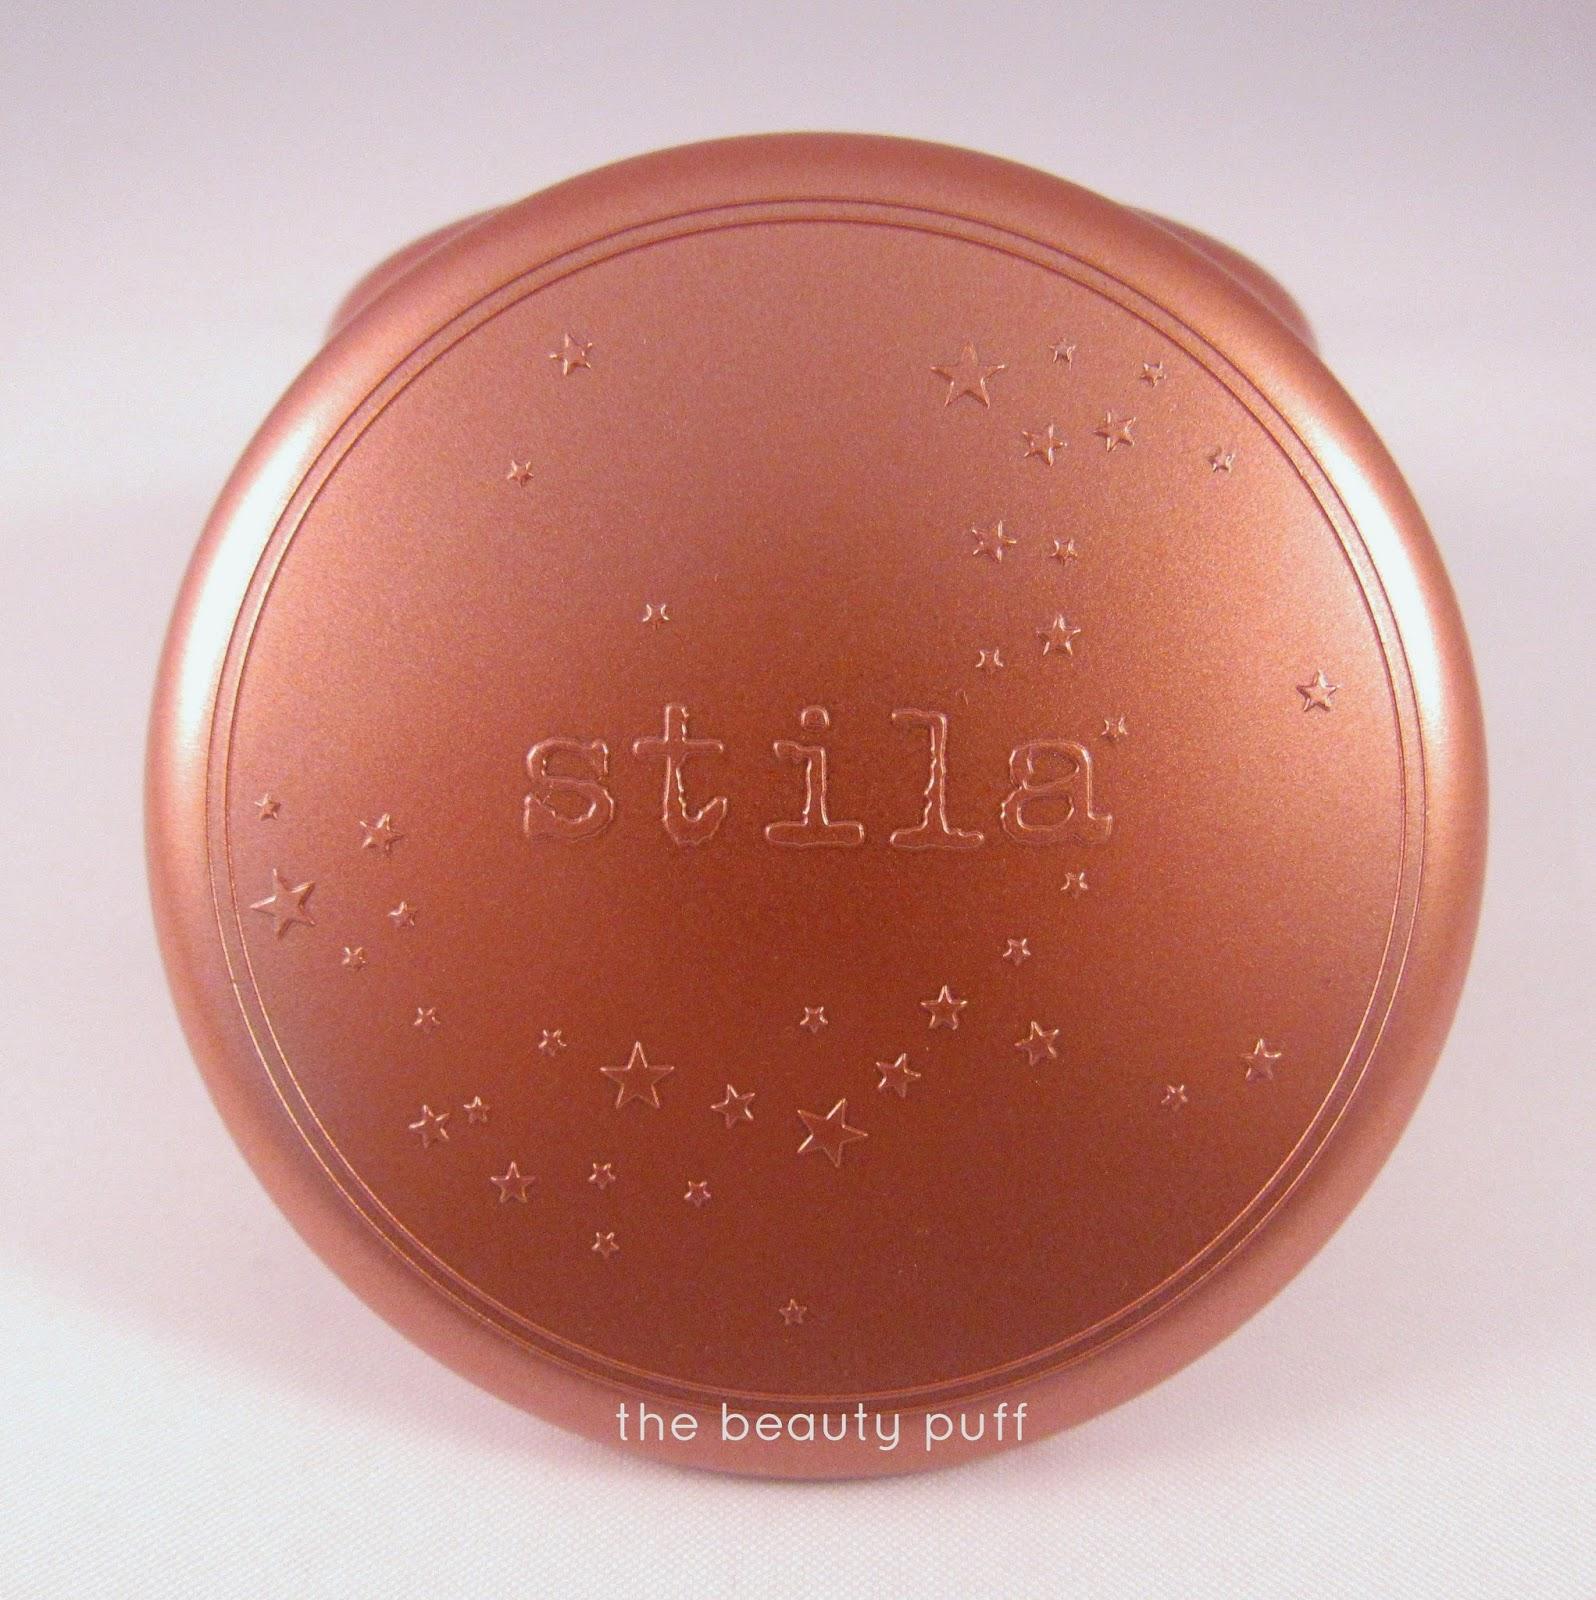 stila sun bronzer - the beauty puff